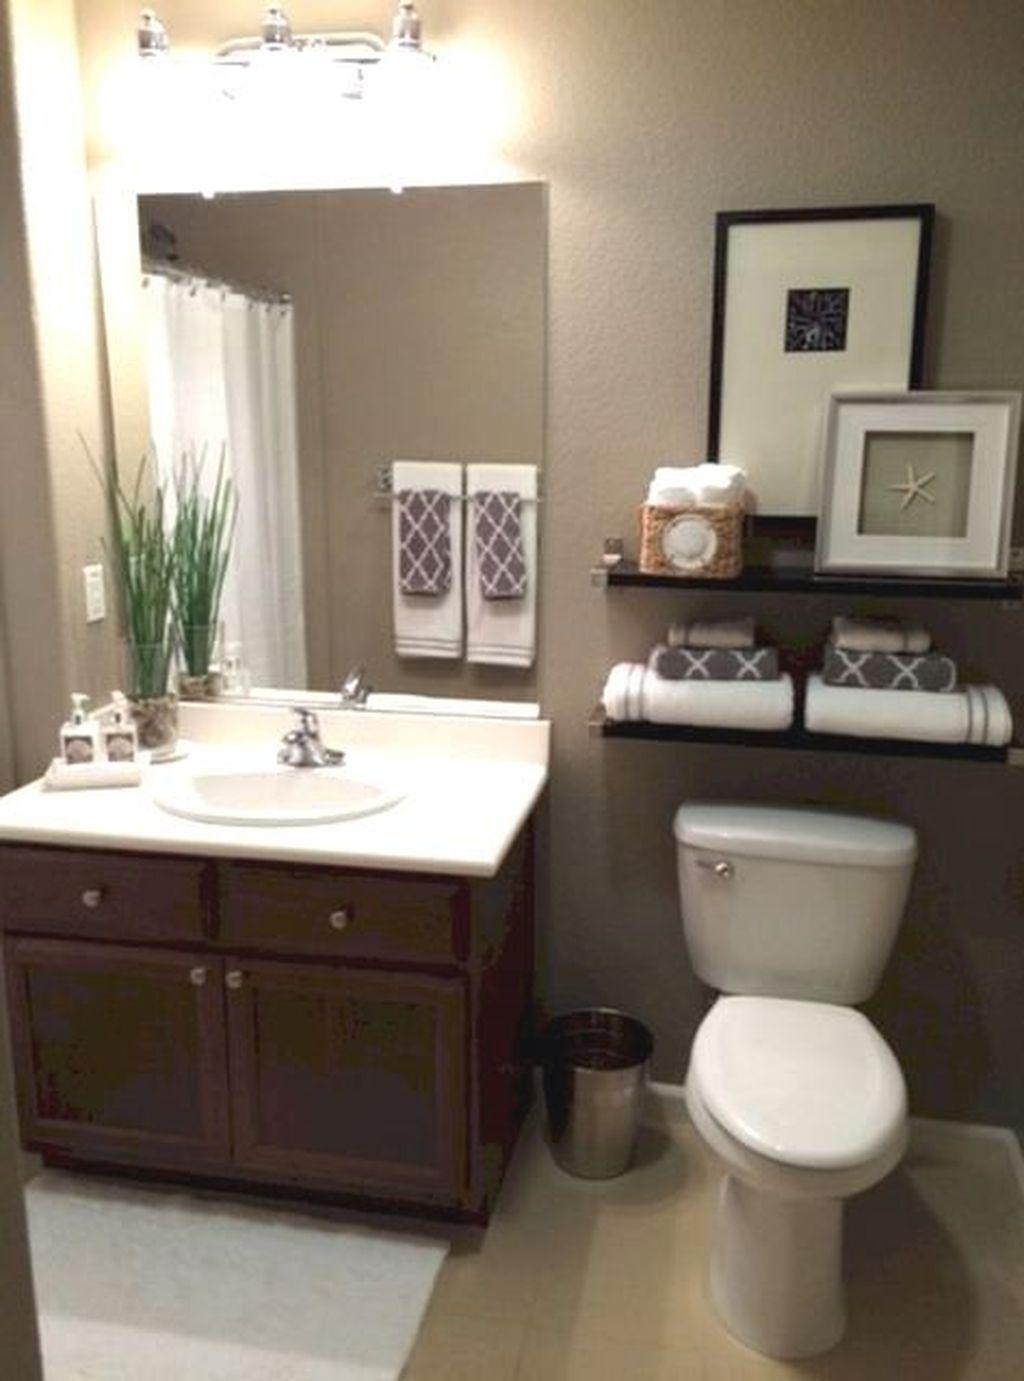 40 Attractive Half Bathroom Ideas On A Budget In 2020 Bathroom Wall Decor Small Bathroom Decor Rustic Bathroom Wall Decor